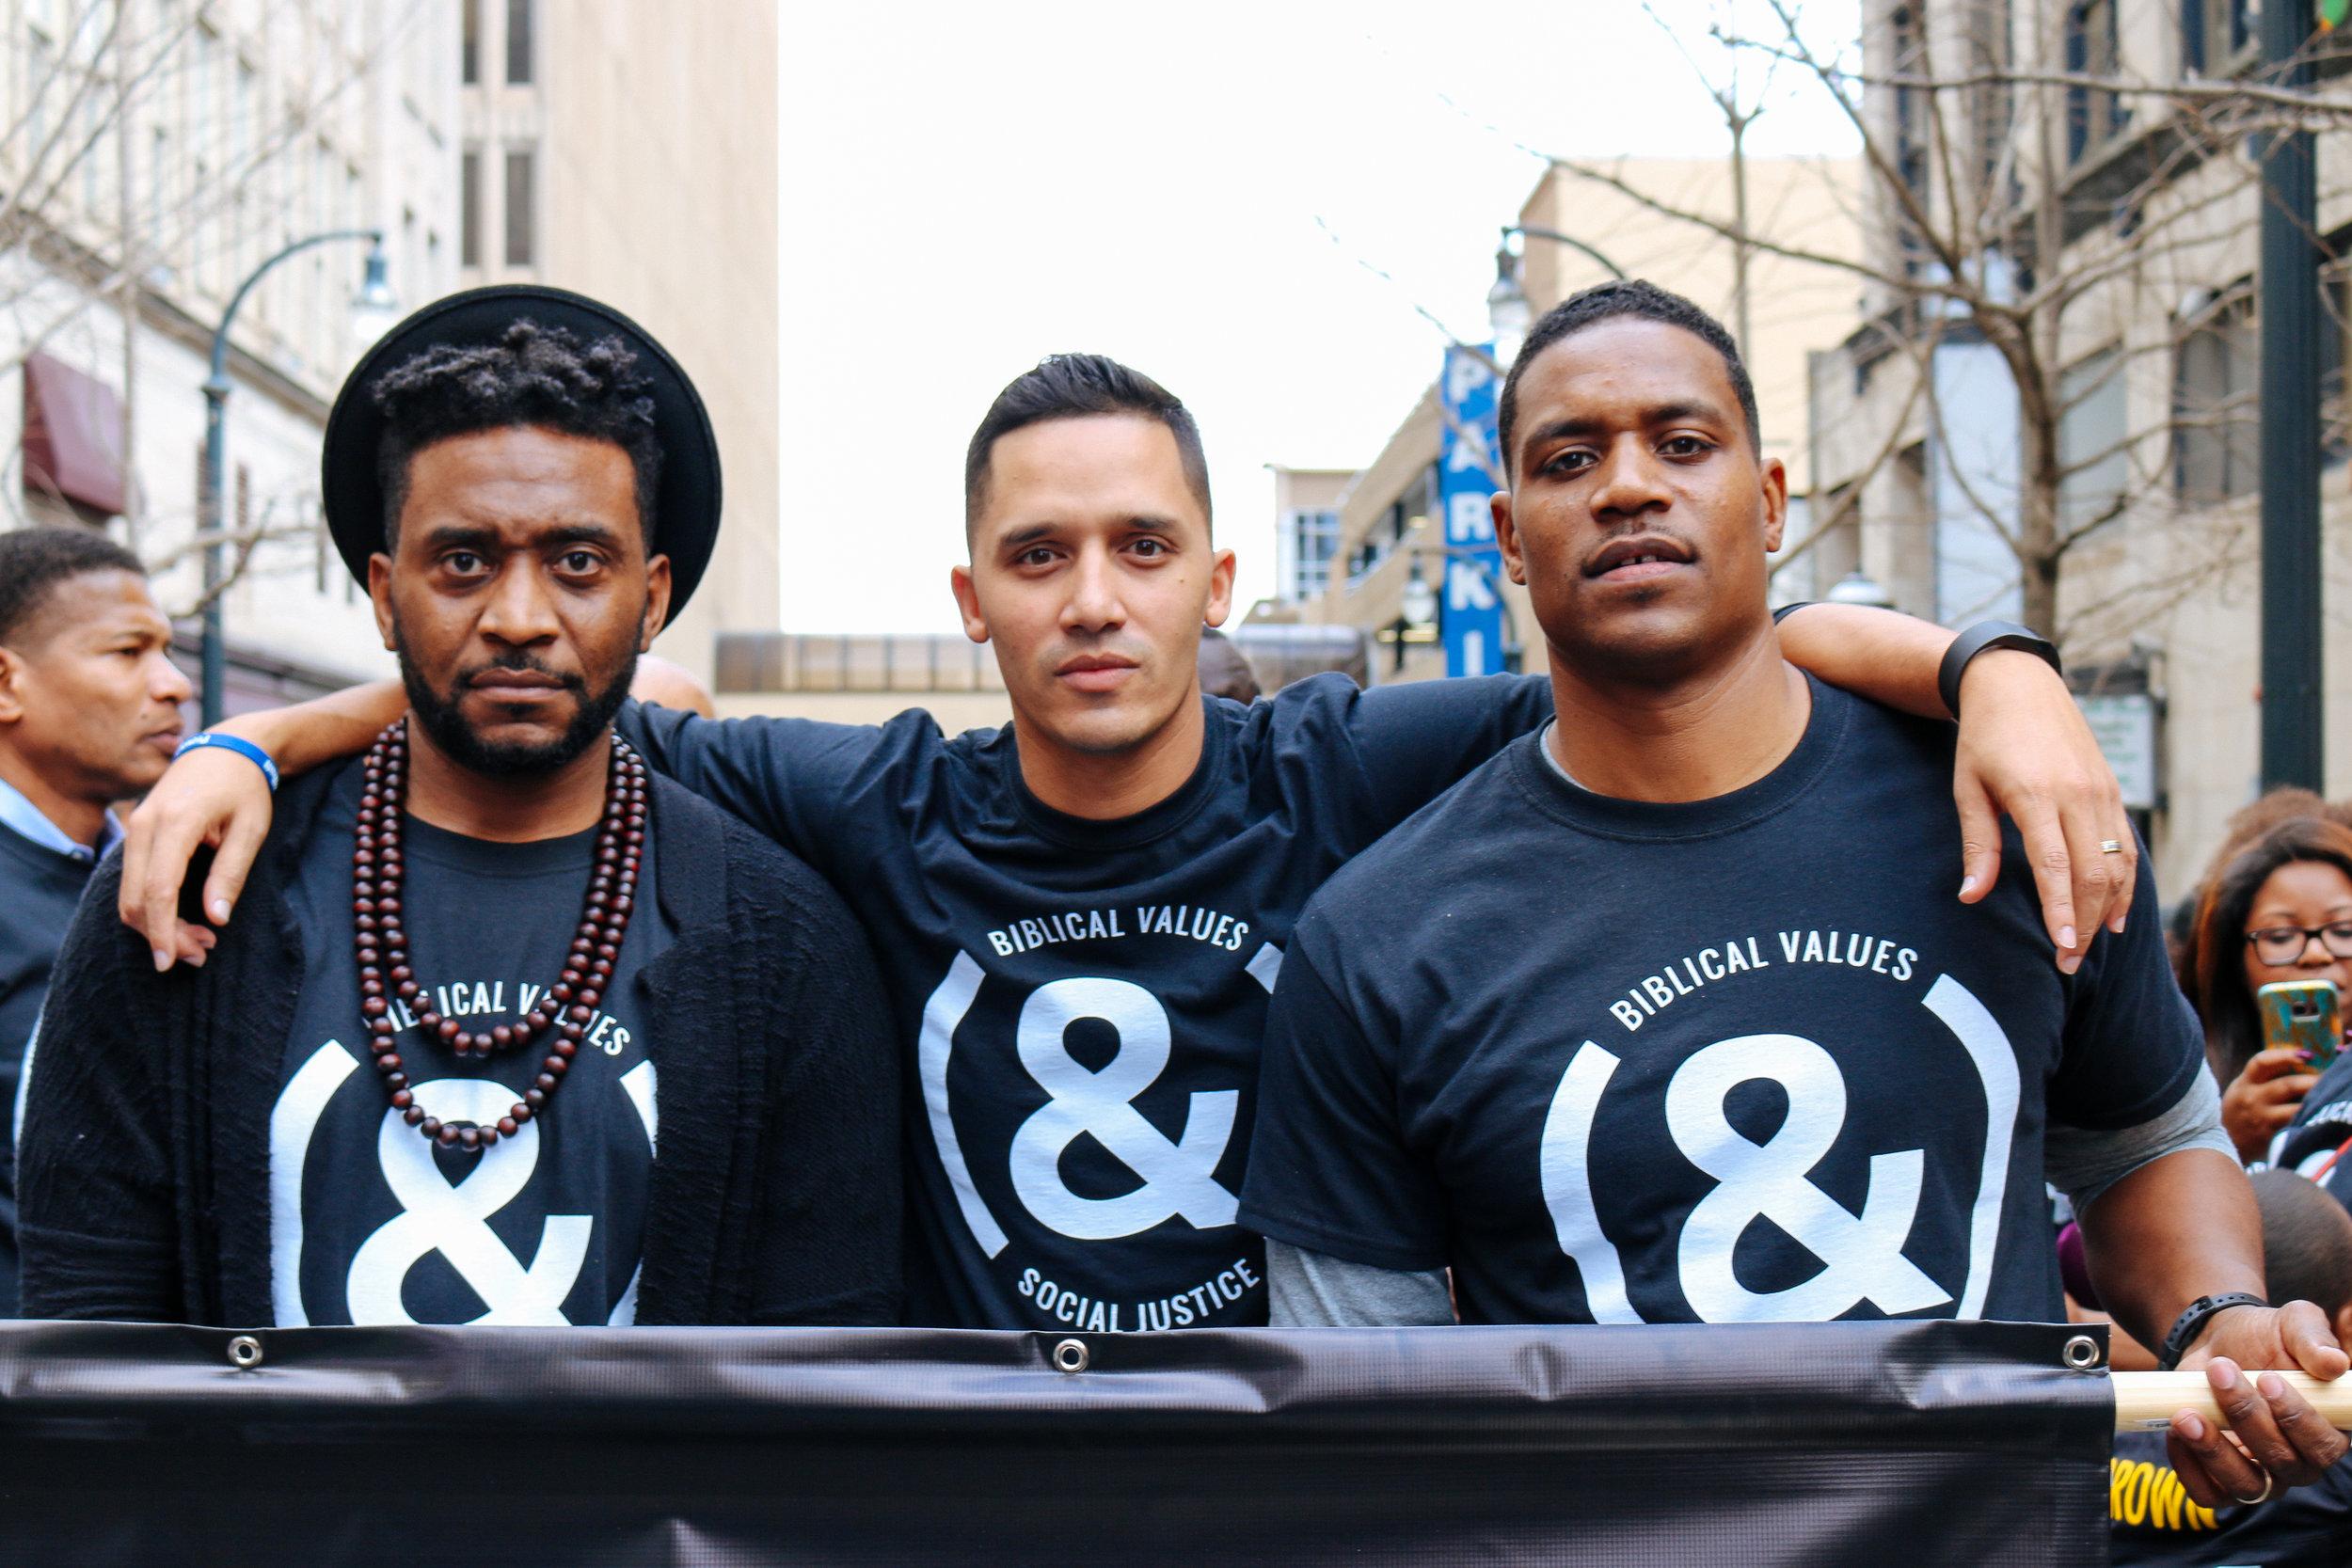 20170116_ANDCampaign_MLKMarch_AtlantaGA_BAPPhotography_01-52.jpg